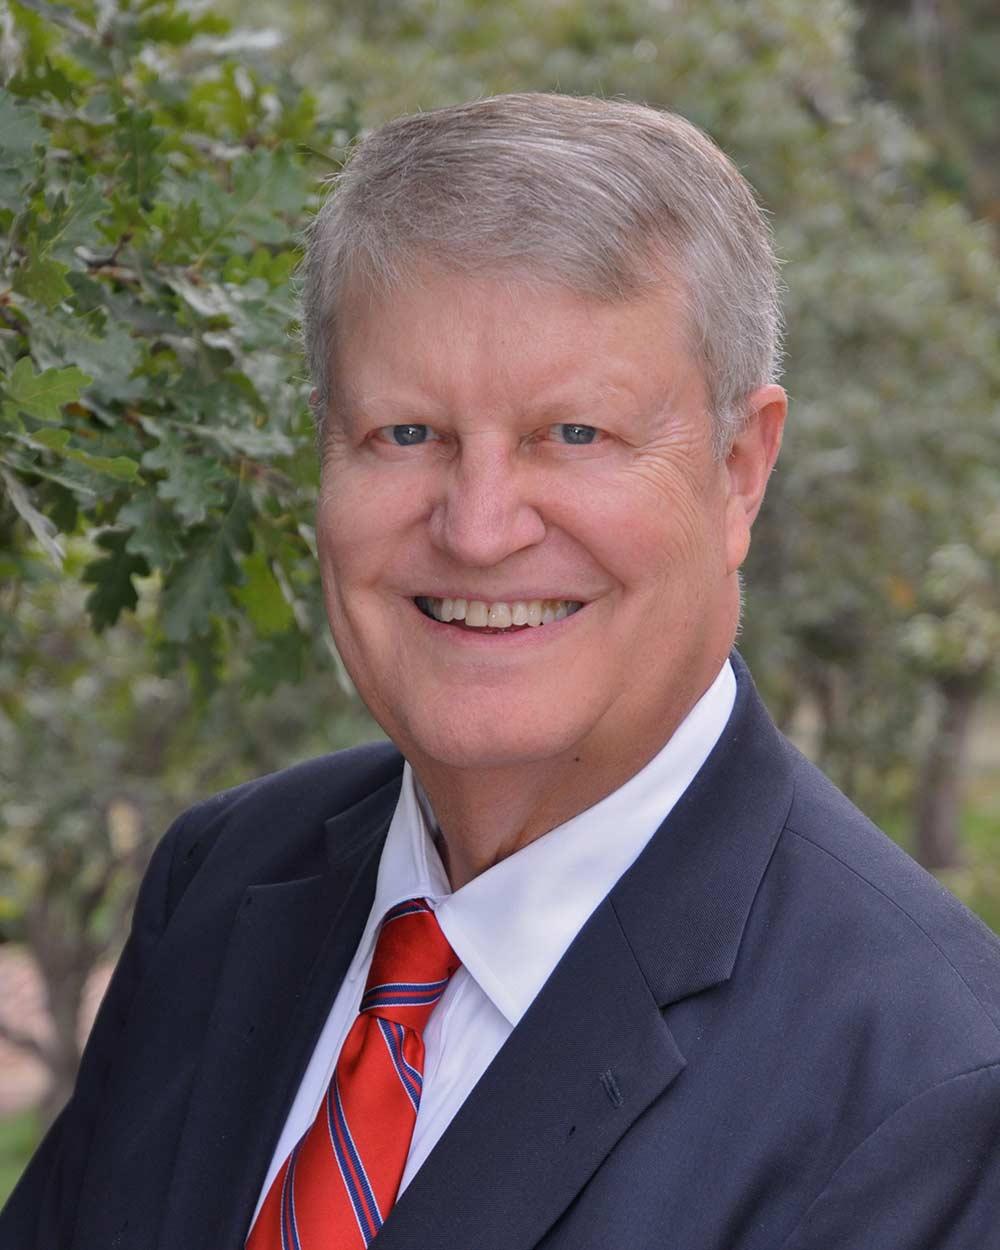 Jon Medved, Myron Stratton Home, Staff, Colorado Springs